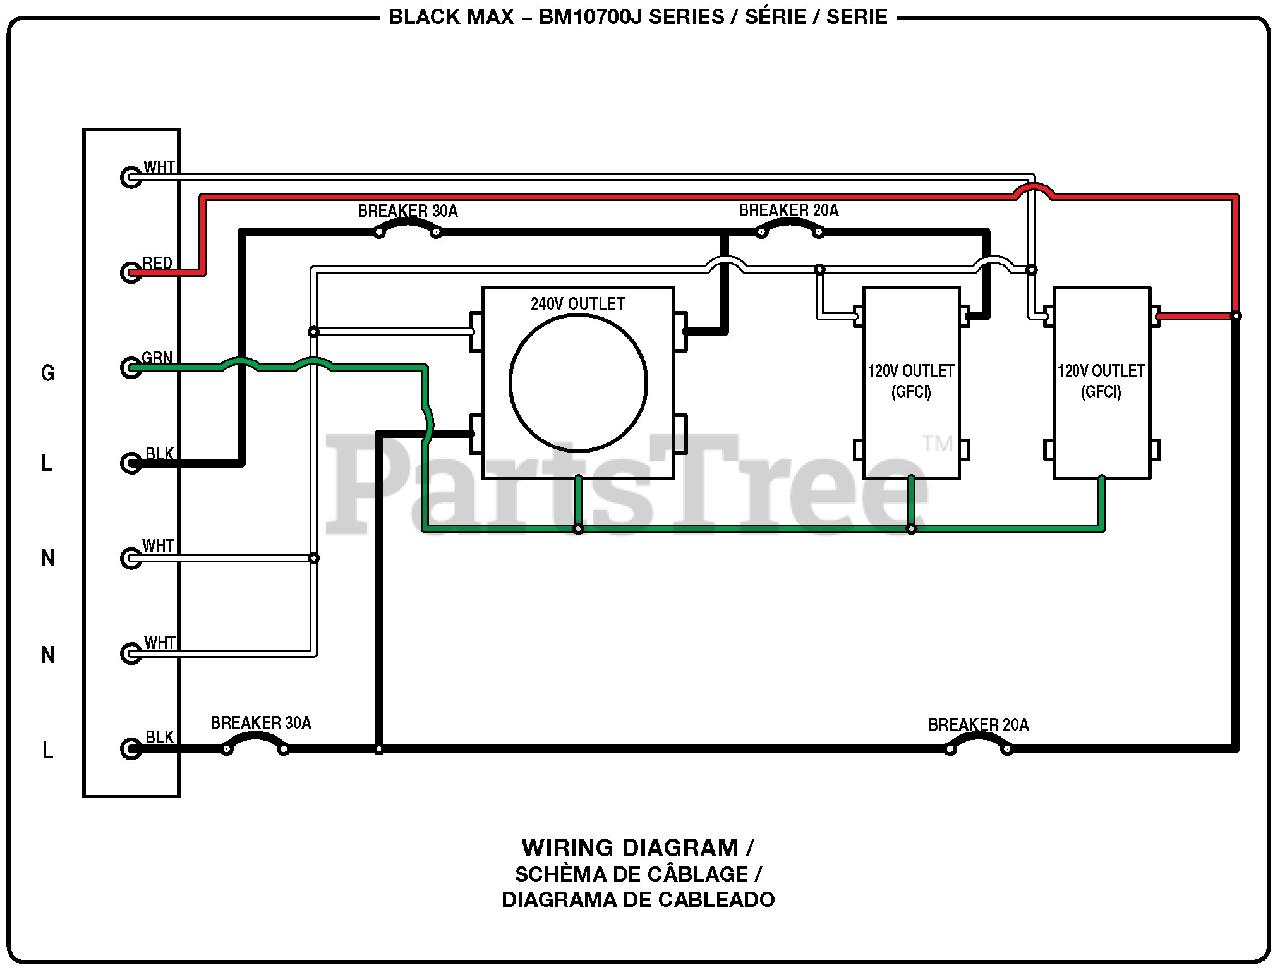 series wiring diagrams black max bm 10700 j black max 7 000 watt generator wiring  black max 7 000 watt generator wiring